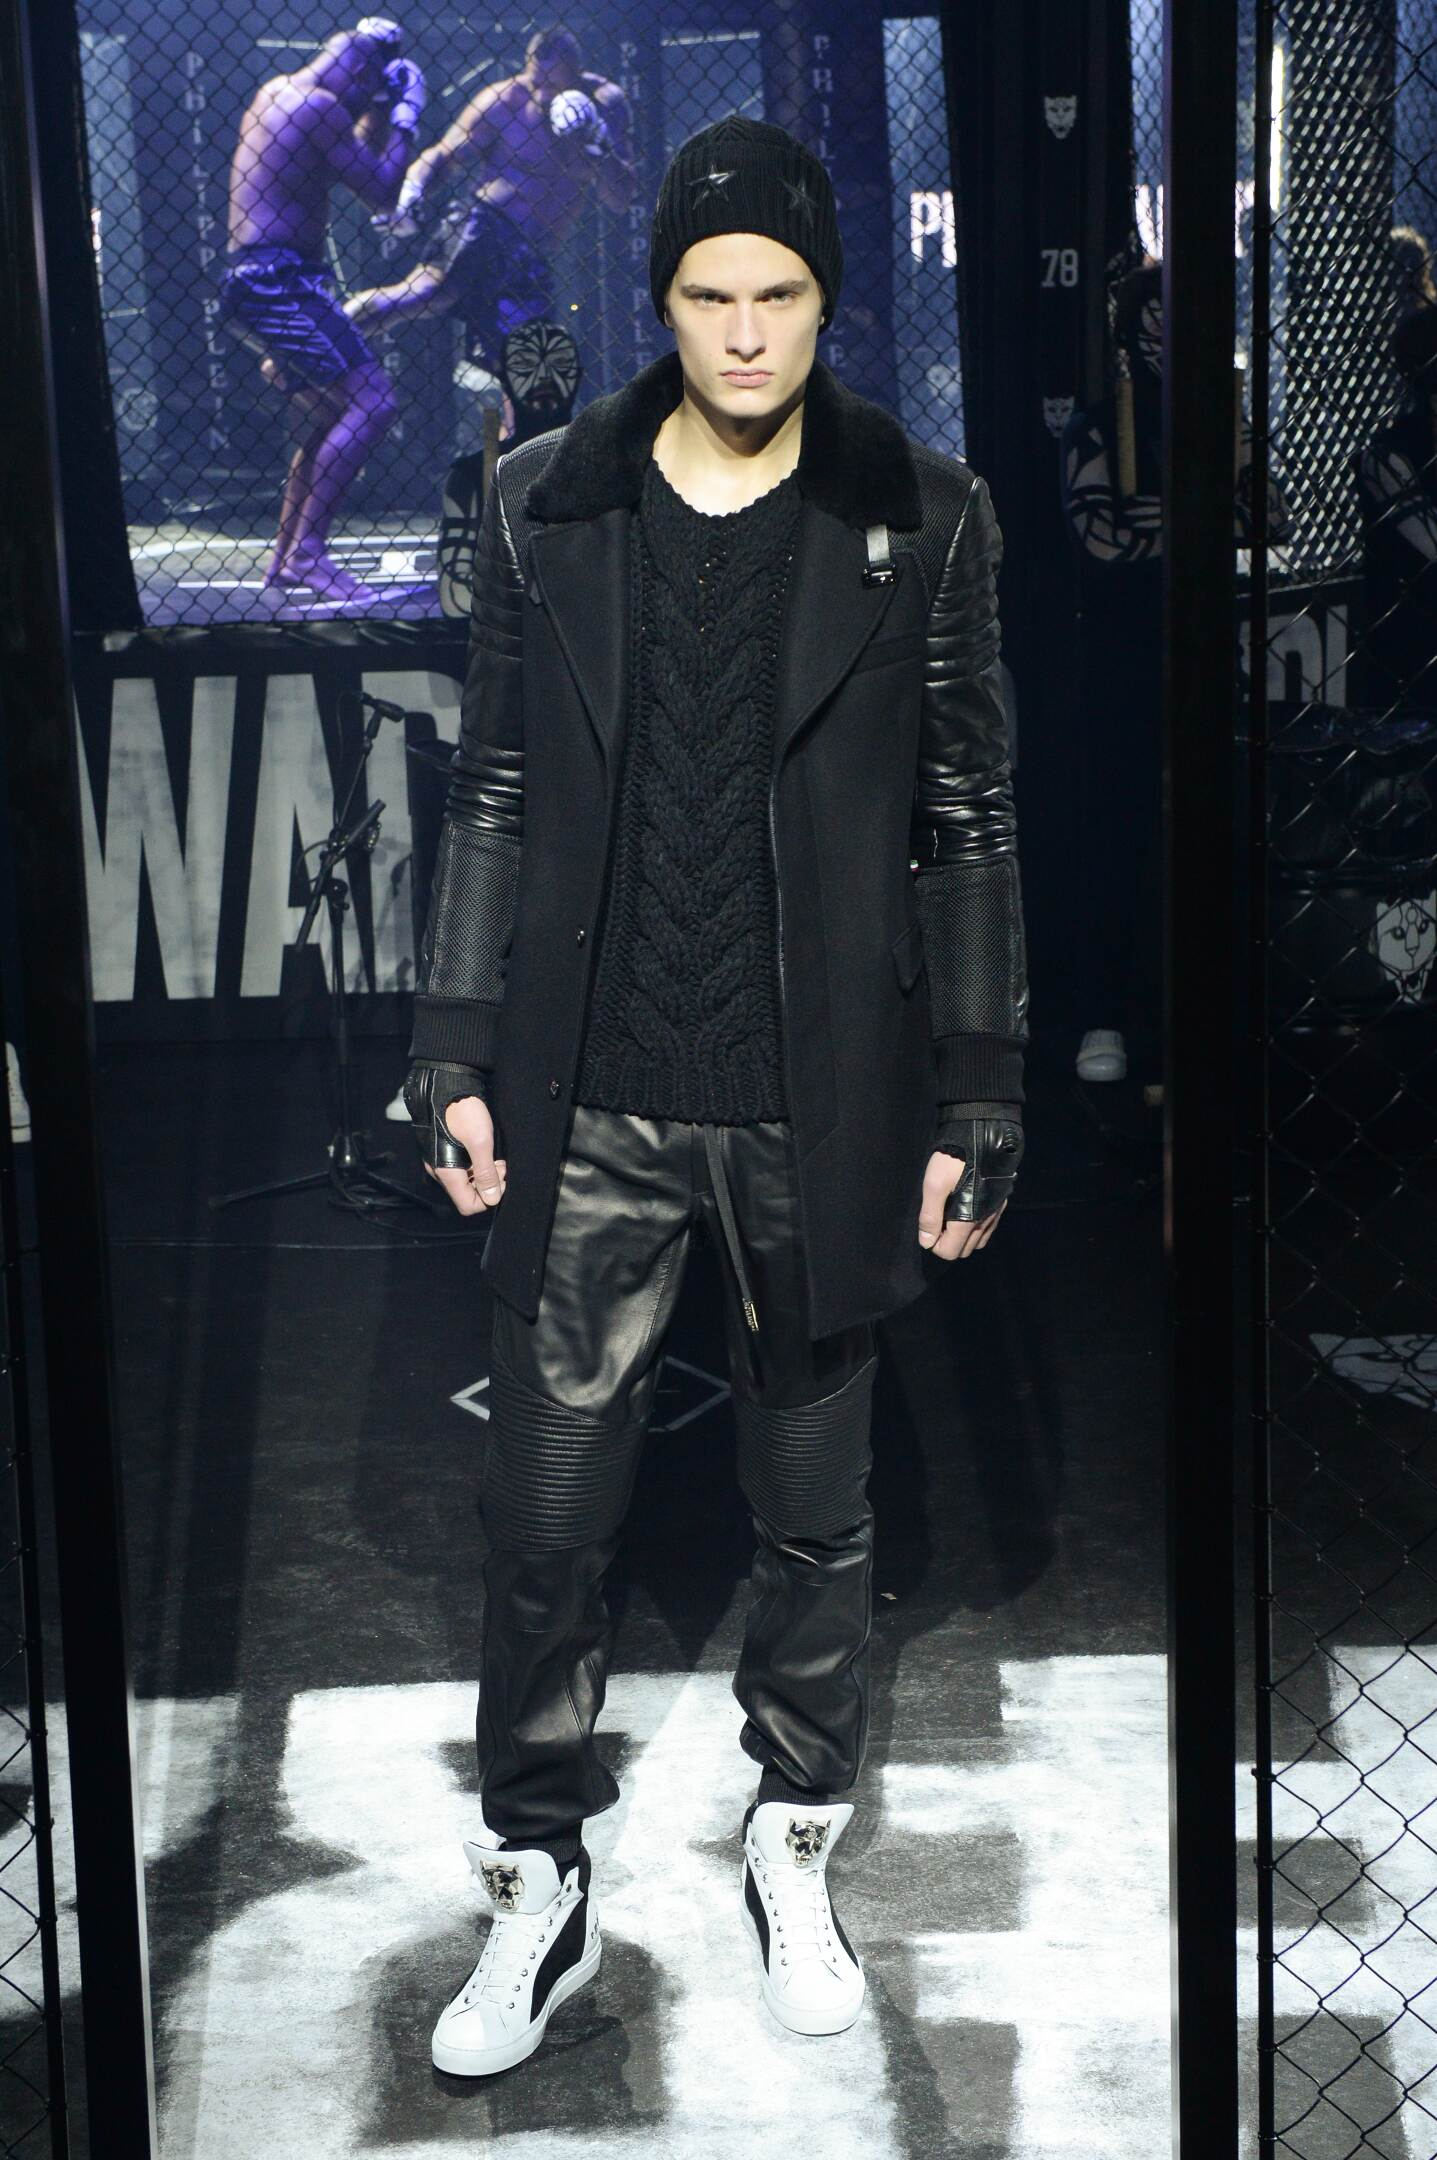 Runway Philipp Plein Fall Winter 2015 16 Men's Collection Milan Fashion Week